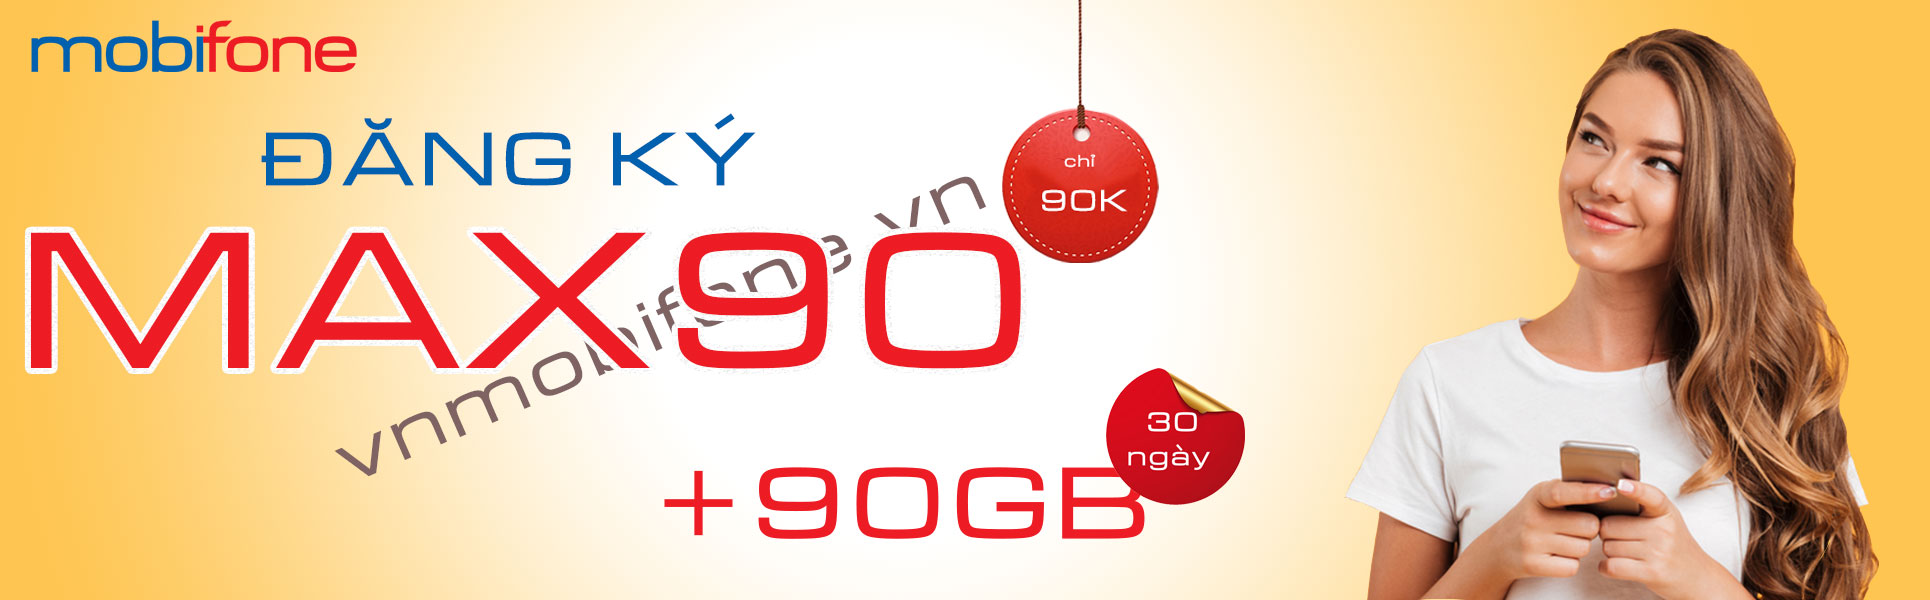 dang-ky-goi-max90-mobifone